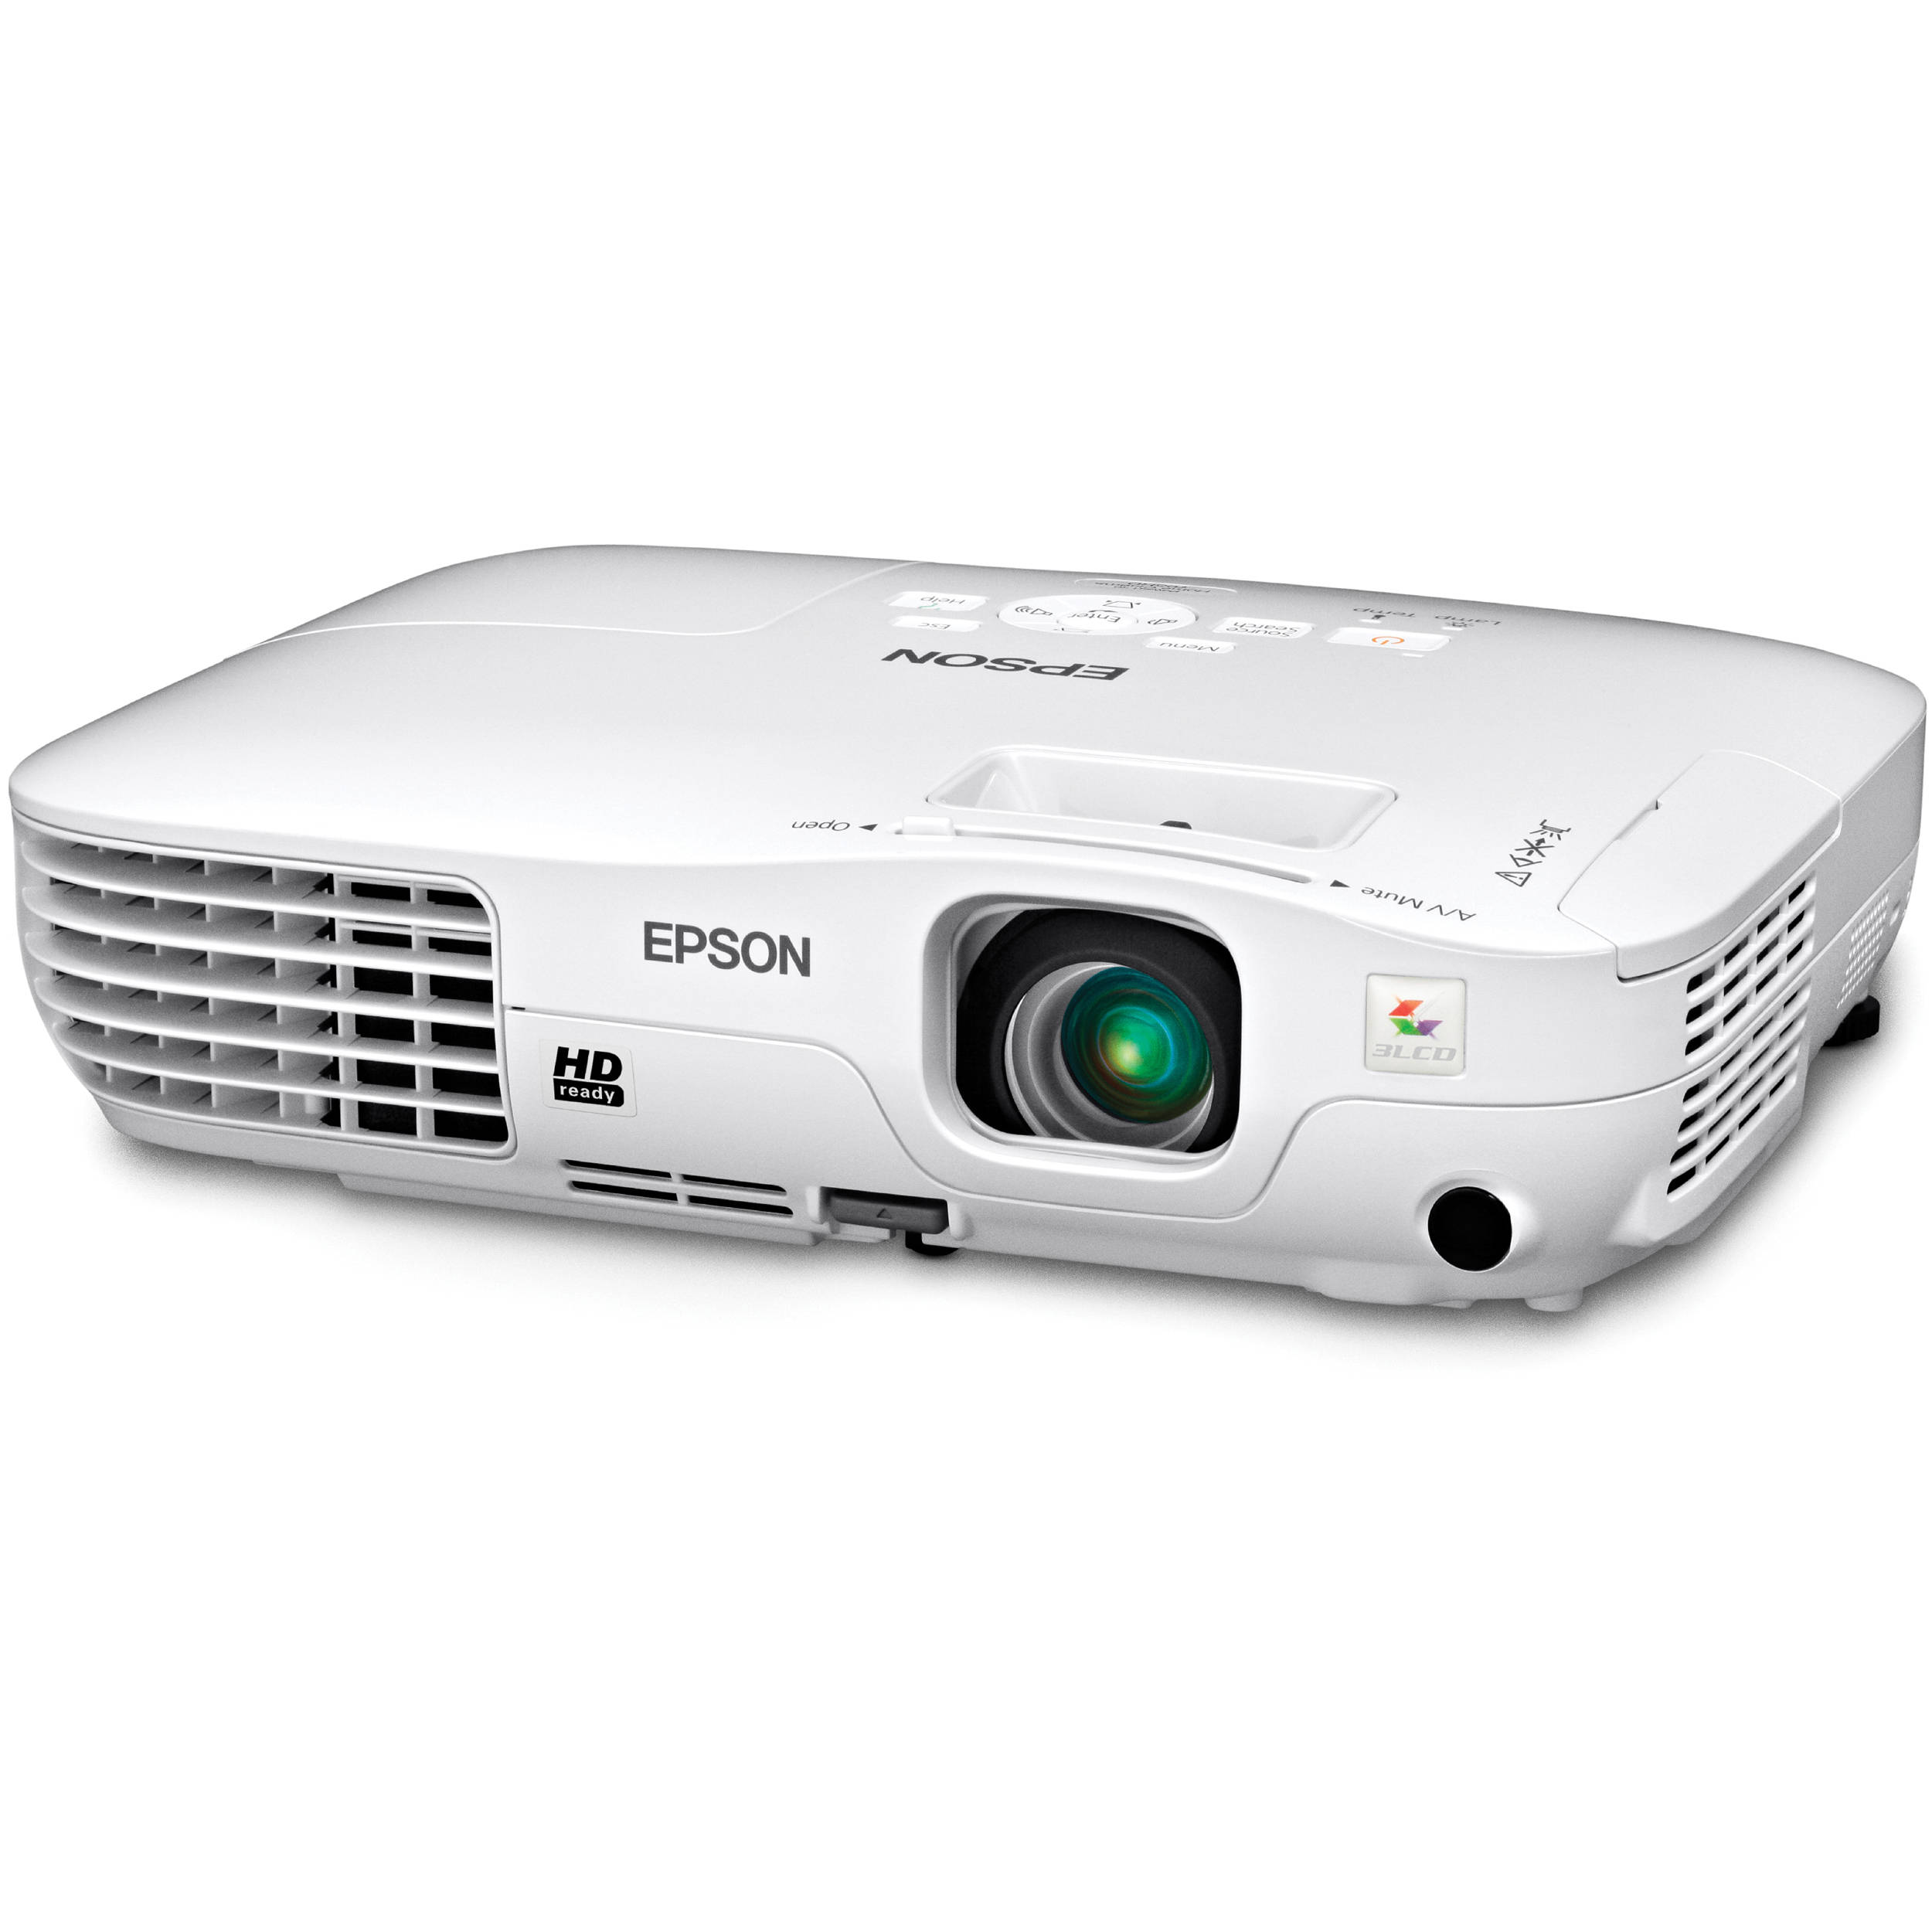 27238be39cd985 Epson 705HD Powerlite Home Cinema LCD Projector V11H331020 B&H